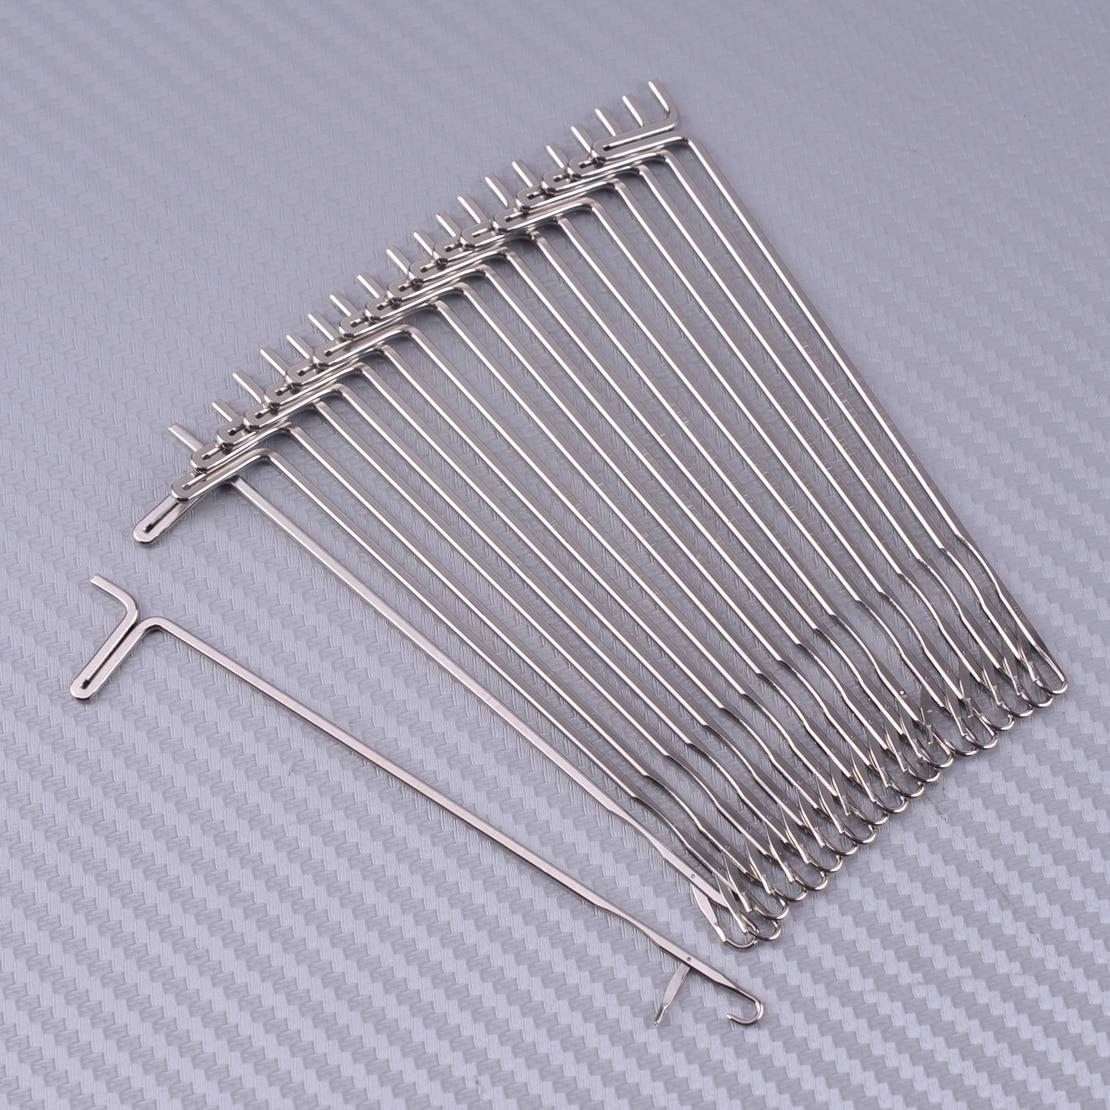 20Pcs/Set Silver Knitting Machine Hook Needles Fit For Reed Singer Studio Empisal Knitmaster LK150 LK360